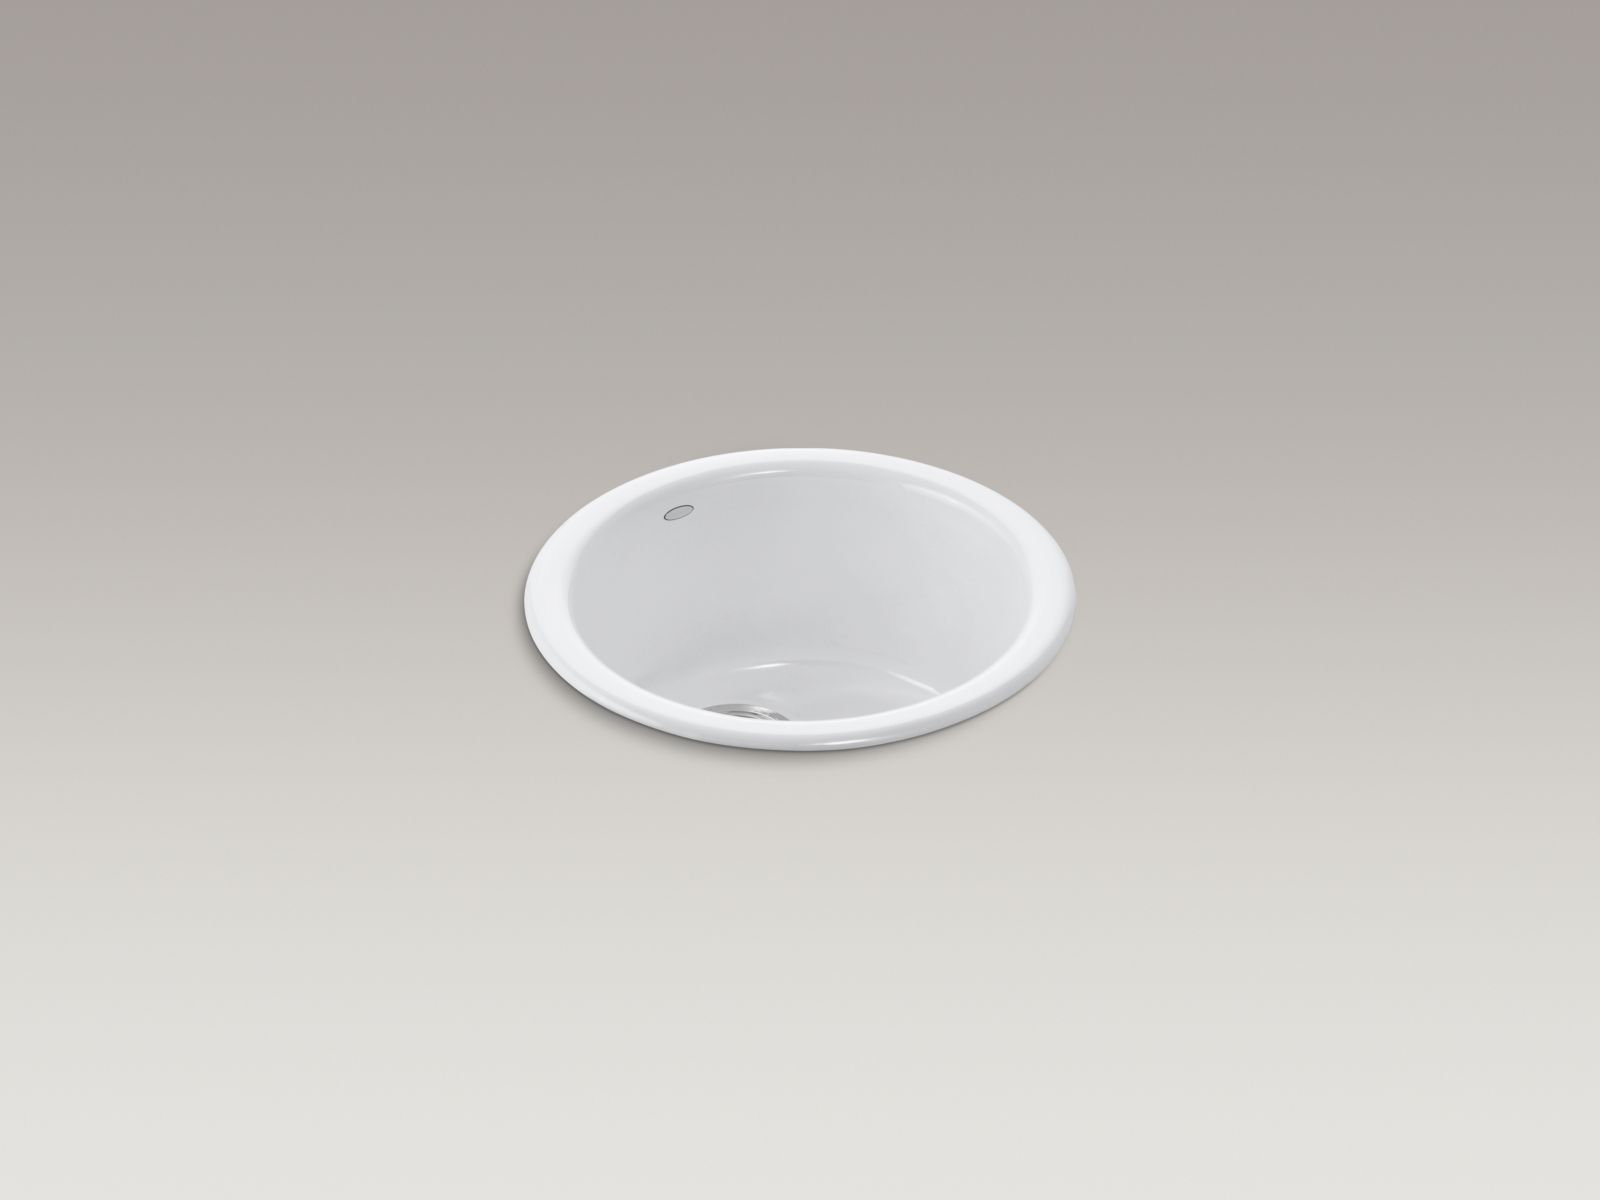 Kohler K-6565-0 Porto Fino Self-Rimming/ Undercounter Entertainment Sink White